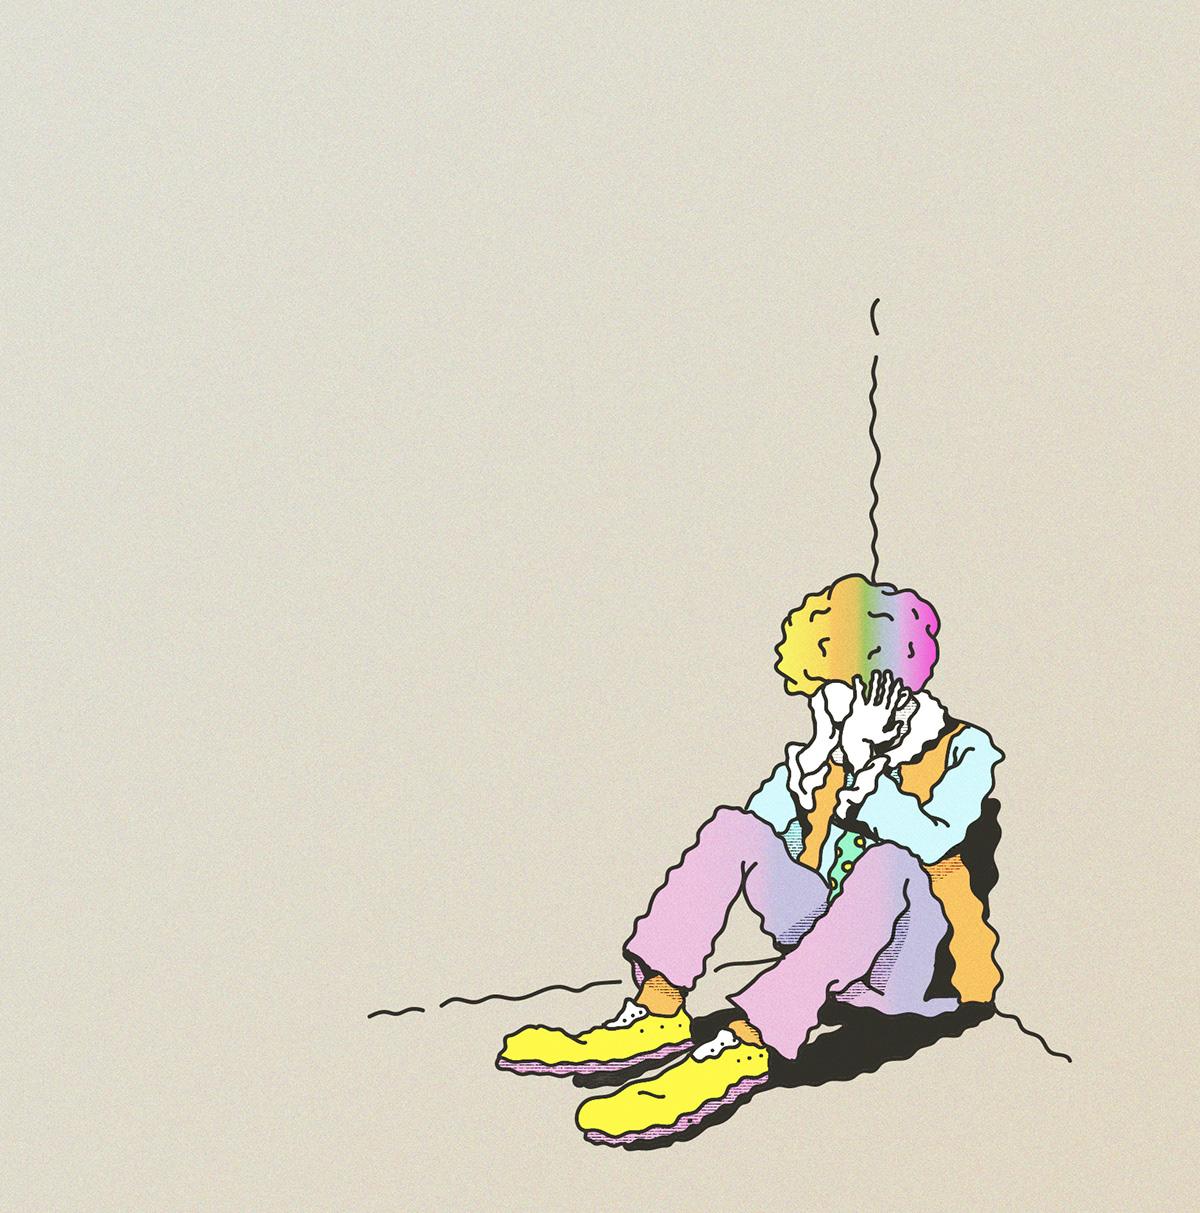 bob dylan,Hard Rain,ILLUSTRATION ,doodle,music,rock,dead,Lyrics